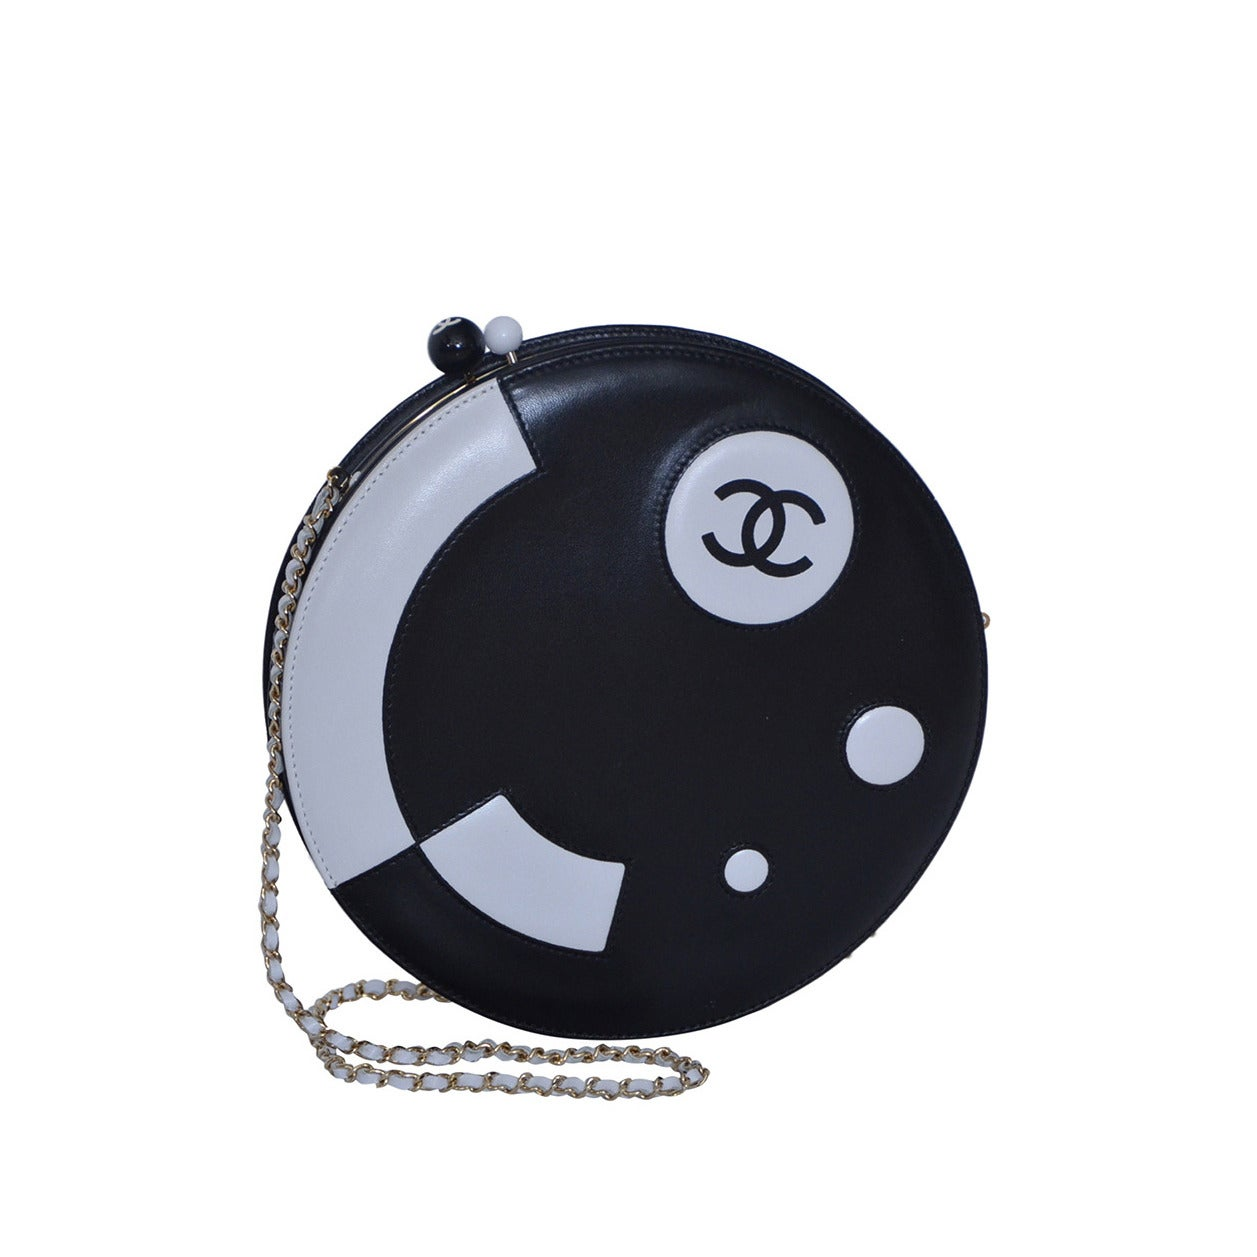 Chanel Rare Circle Vintage Handbag  Mint